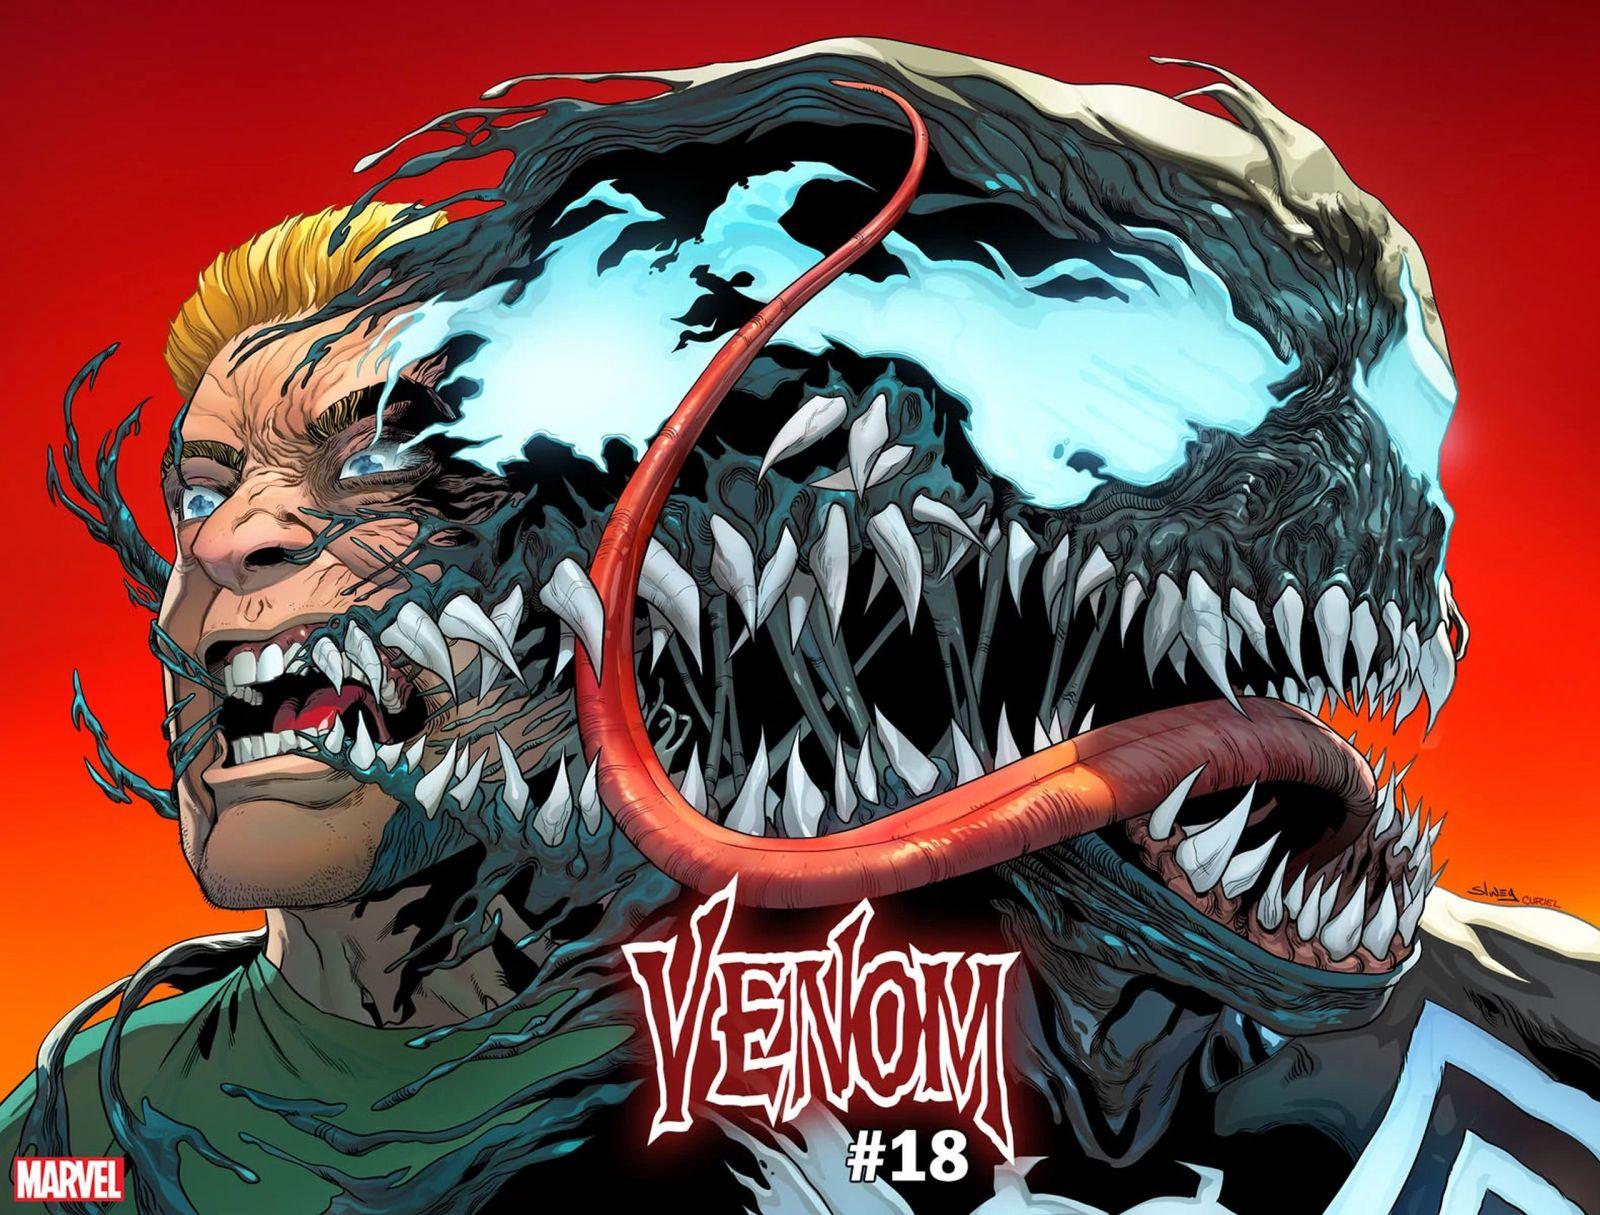 Venom #18